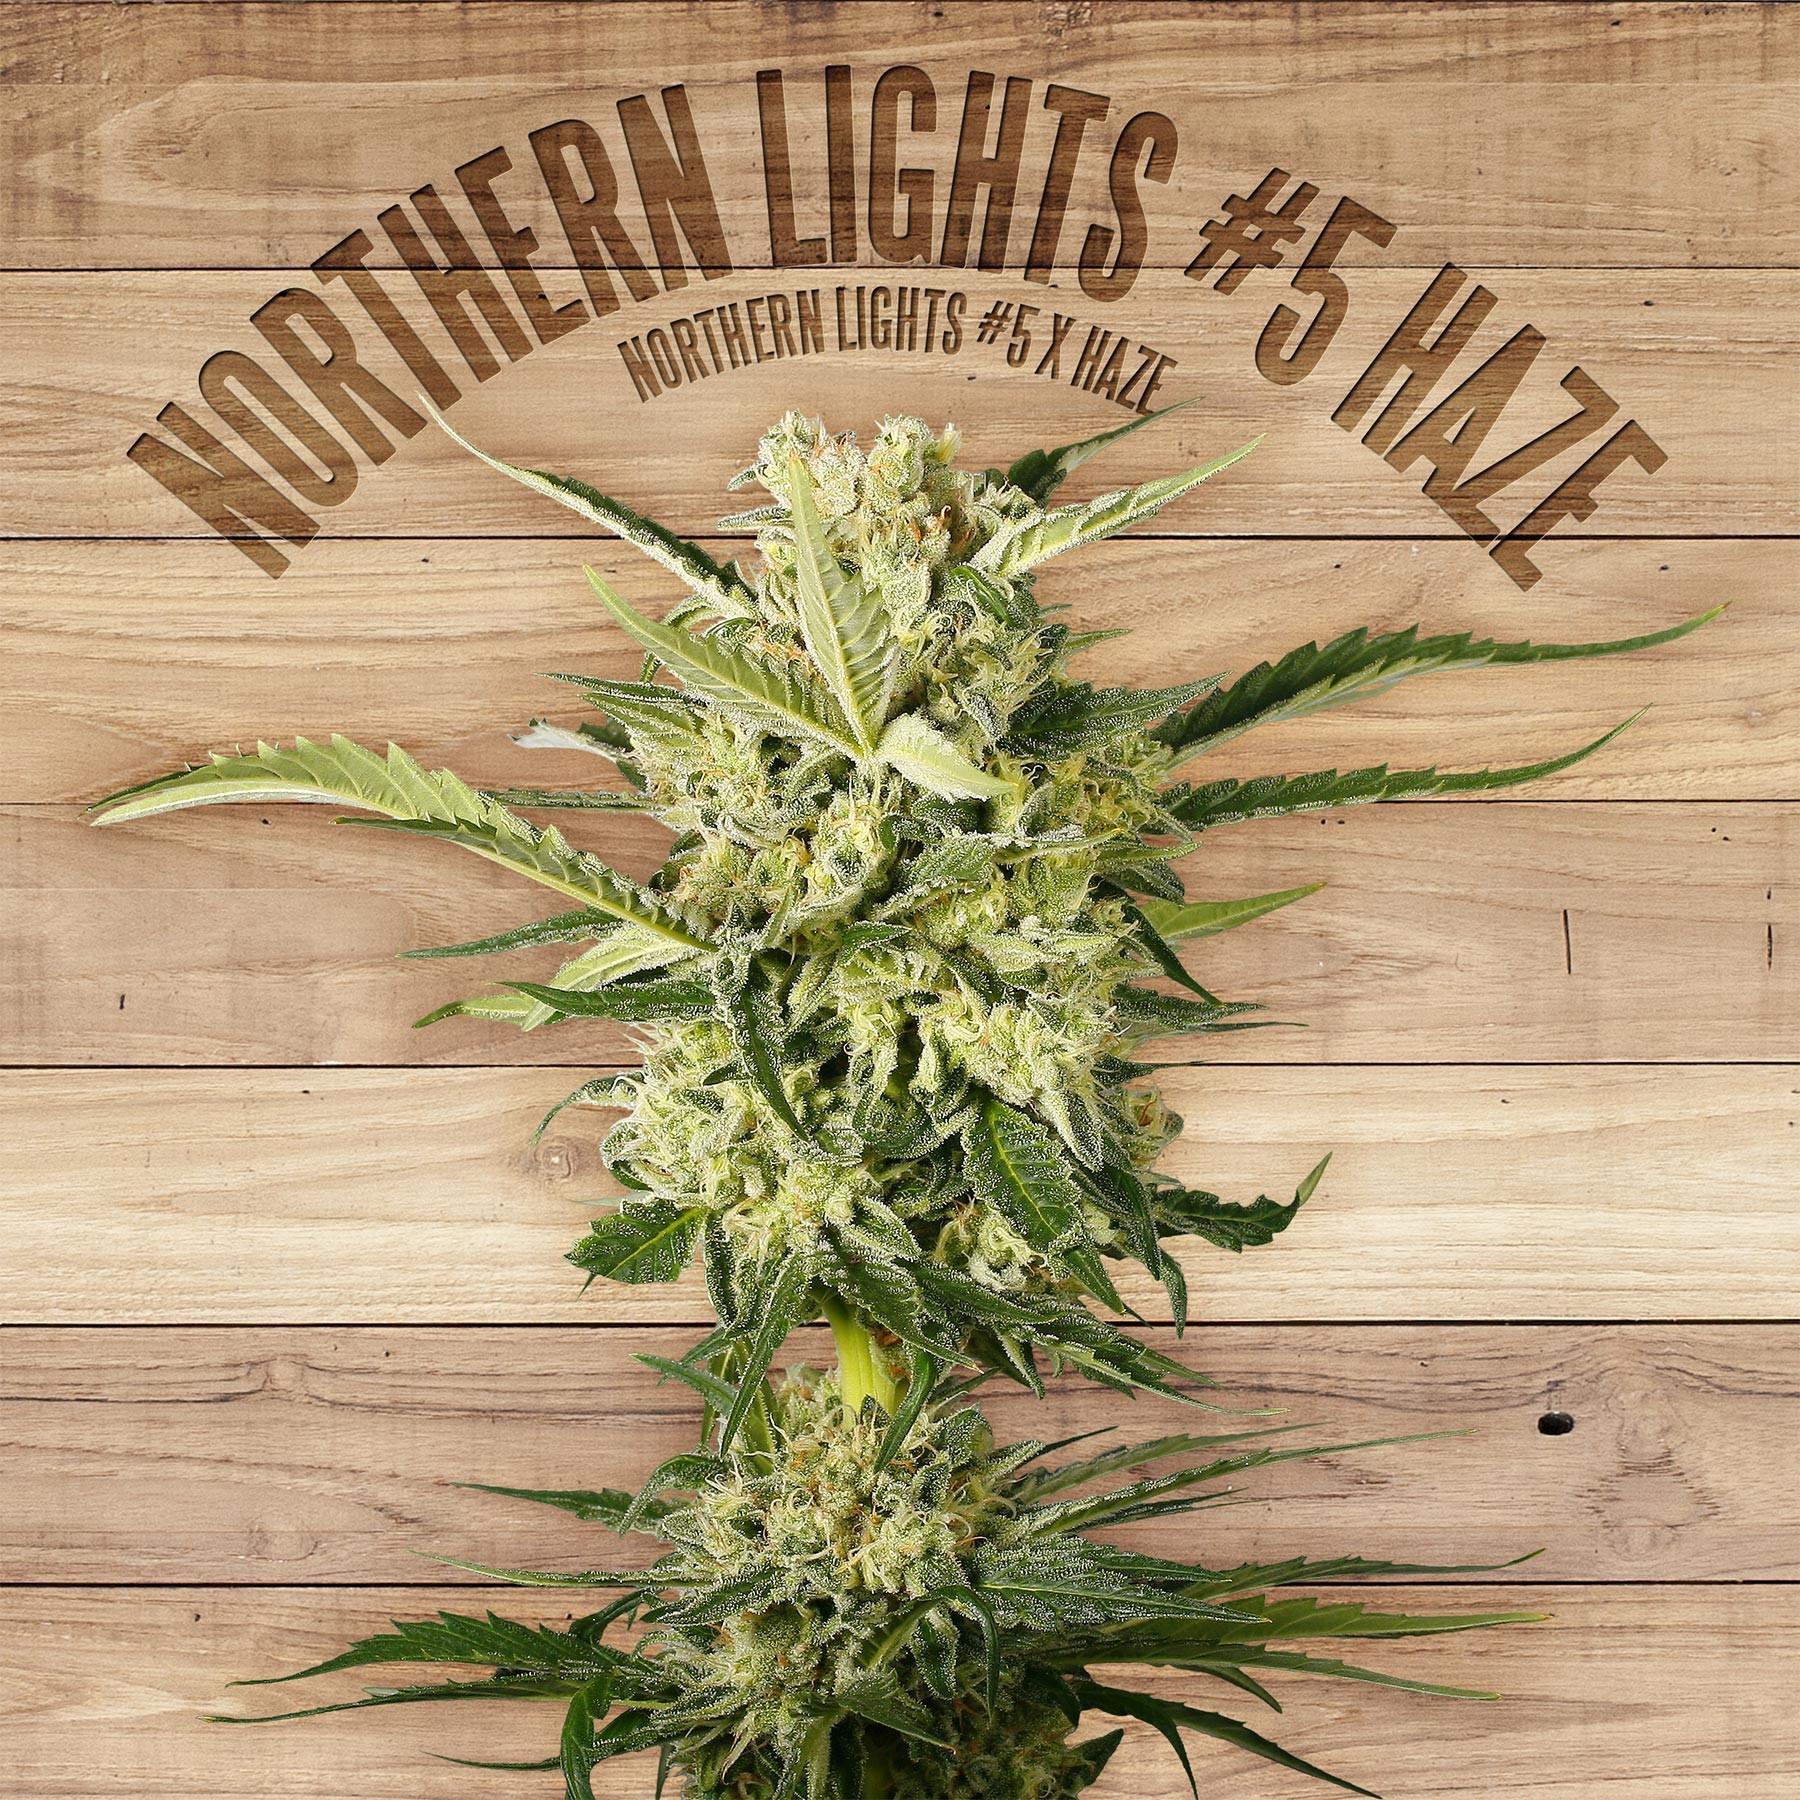 Northern Lights #5 Haze Feminised Seeds   The Plant